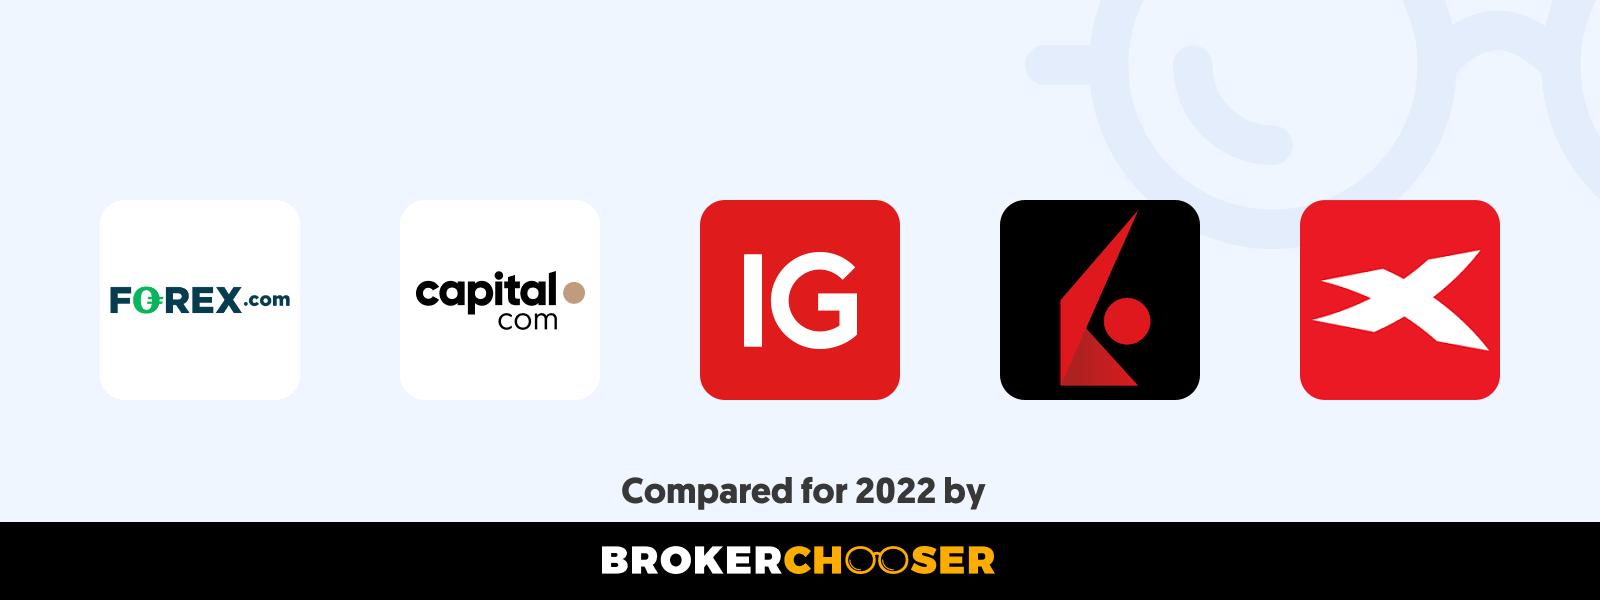 Best forex brokers for beginners in Nepal in 2021